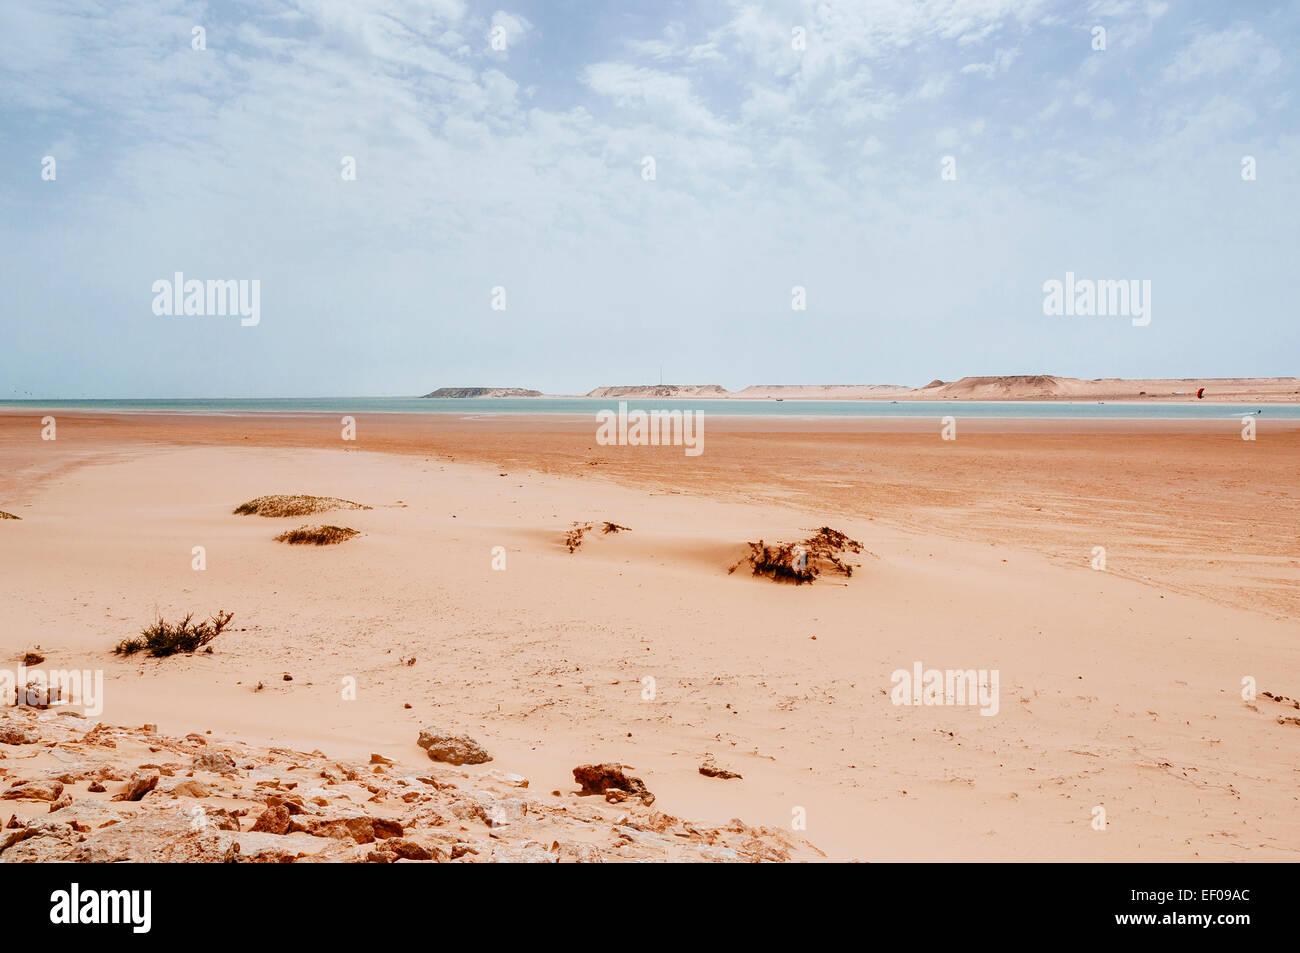 Kitesurf in the sandy coast, Dakhla, Western Sahara, Morocco - Stock Image